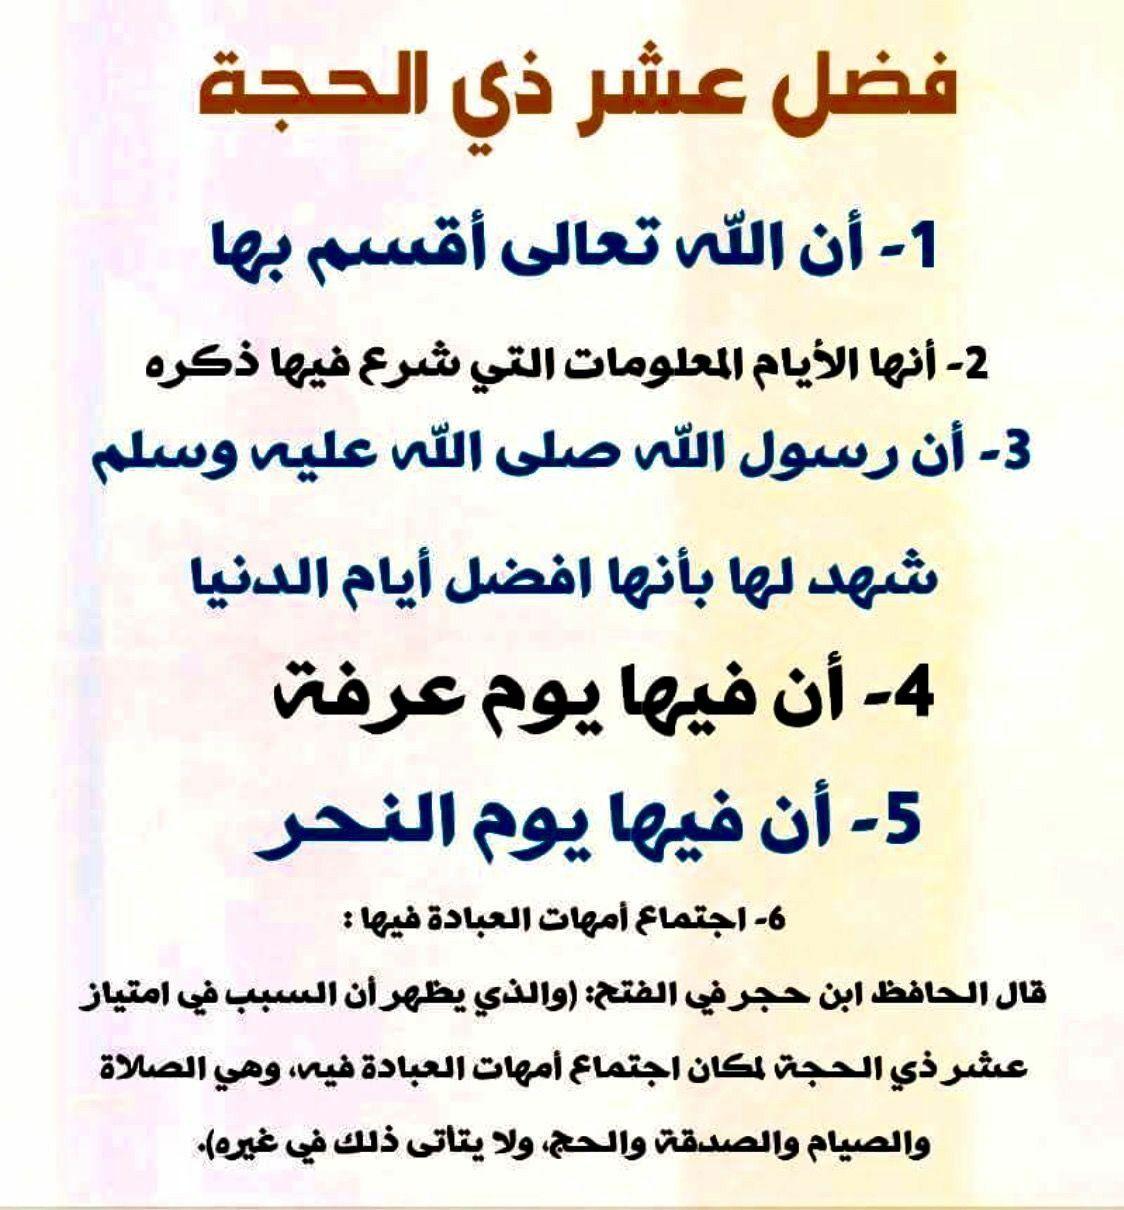 Pin By The Noble Quran On I Love Allah Quran Islam The Prophet Miracles Hadith Heaven Prophets Faith Prayer Dua حكم وعبر احاديث الله اسلام قرآن دعاء Math Life Math Equations